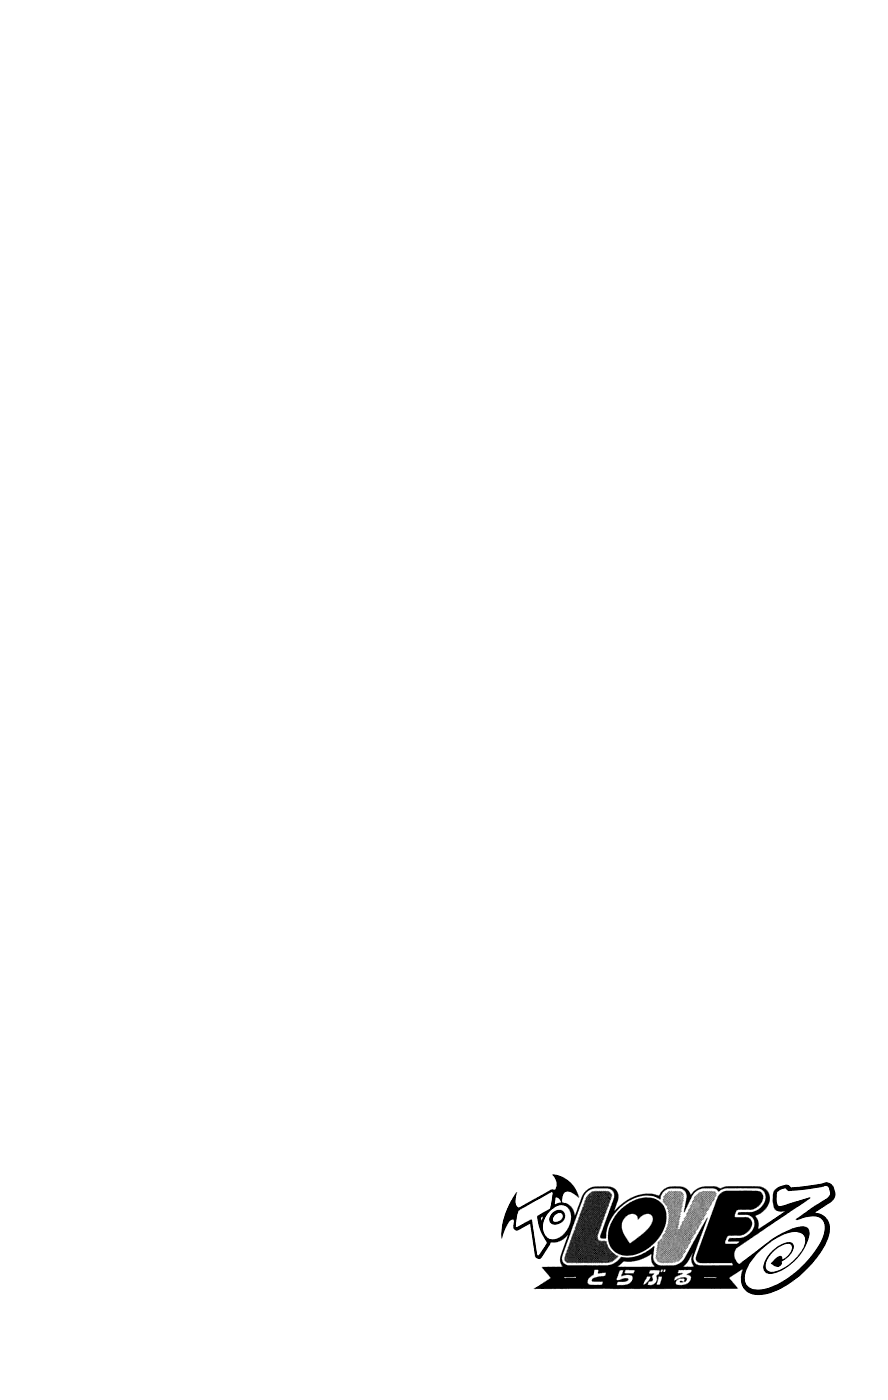 Манга Любовные неприятности / To Love-Ru  - Том 6 Глава 47 Страница 20